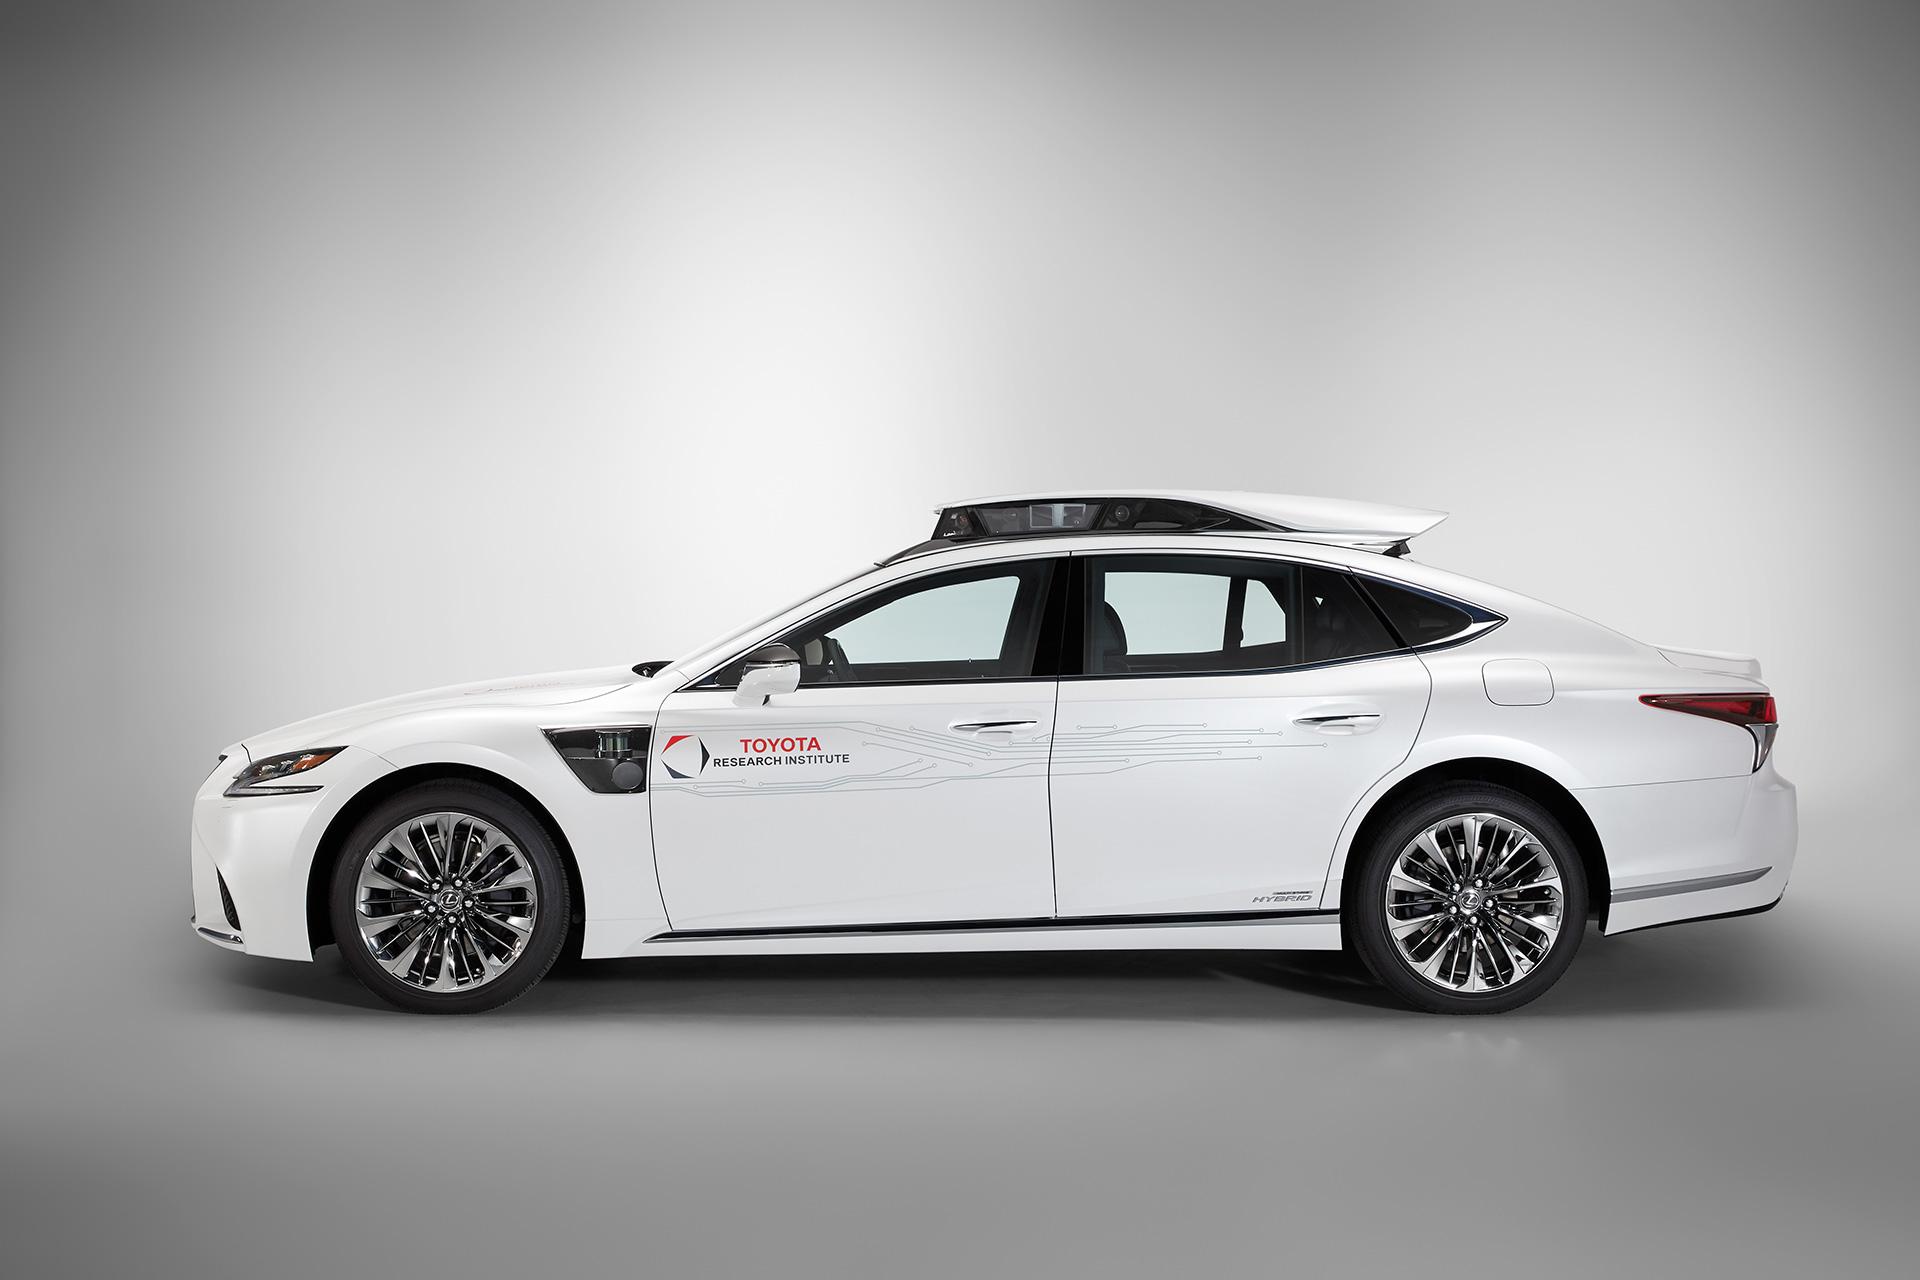 「【CES 2019】新型レクサスLSをベースとした自動運転実験車「TRI-P4」を披露」の13枚目の画像